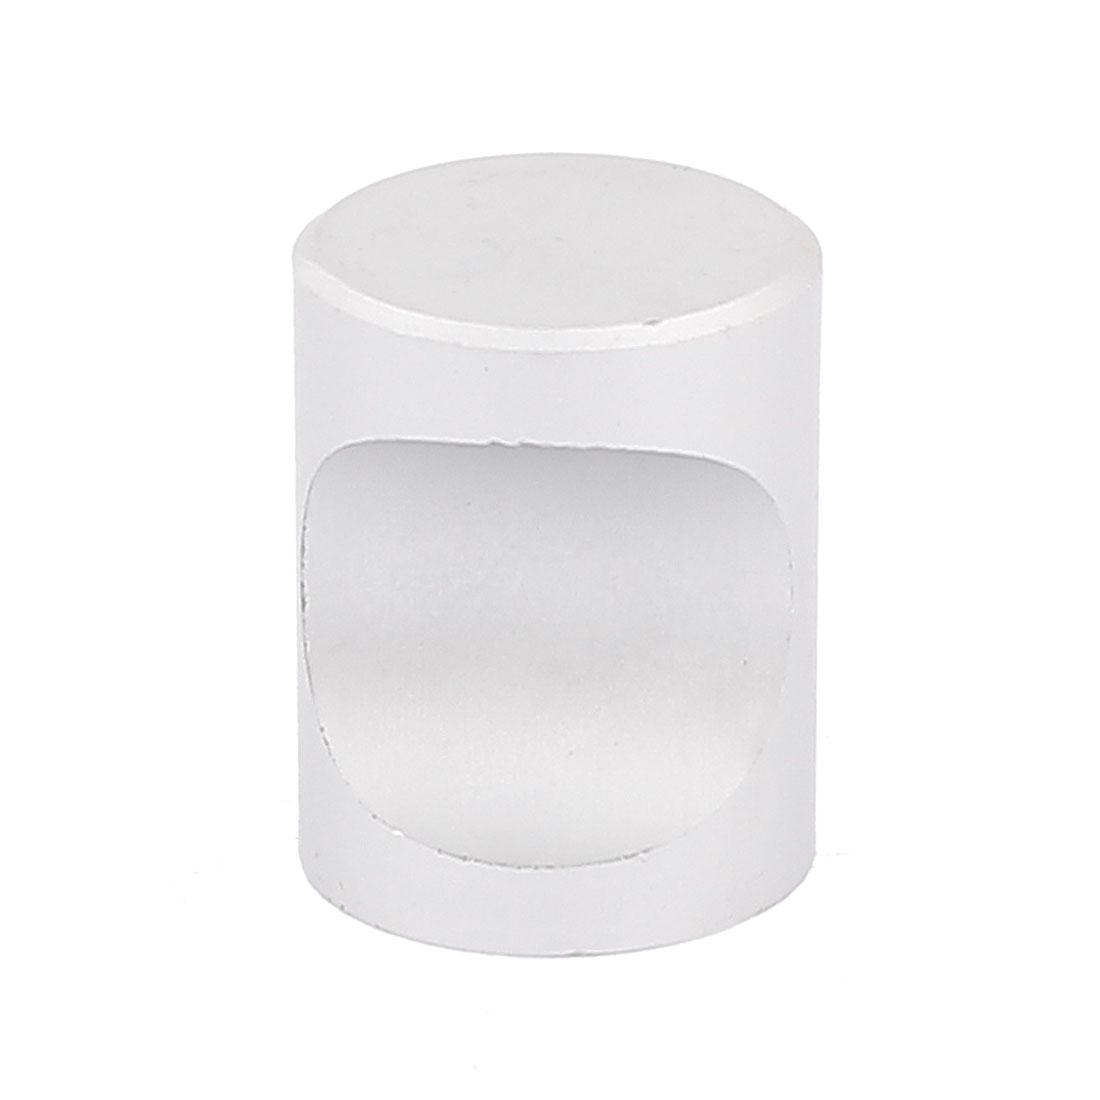 Dresser Door Cabinet Single Hole Flat Cylinder Pull Handles Knobs Silver Tone w Screw